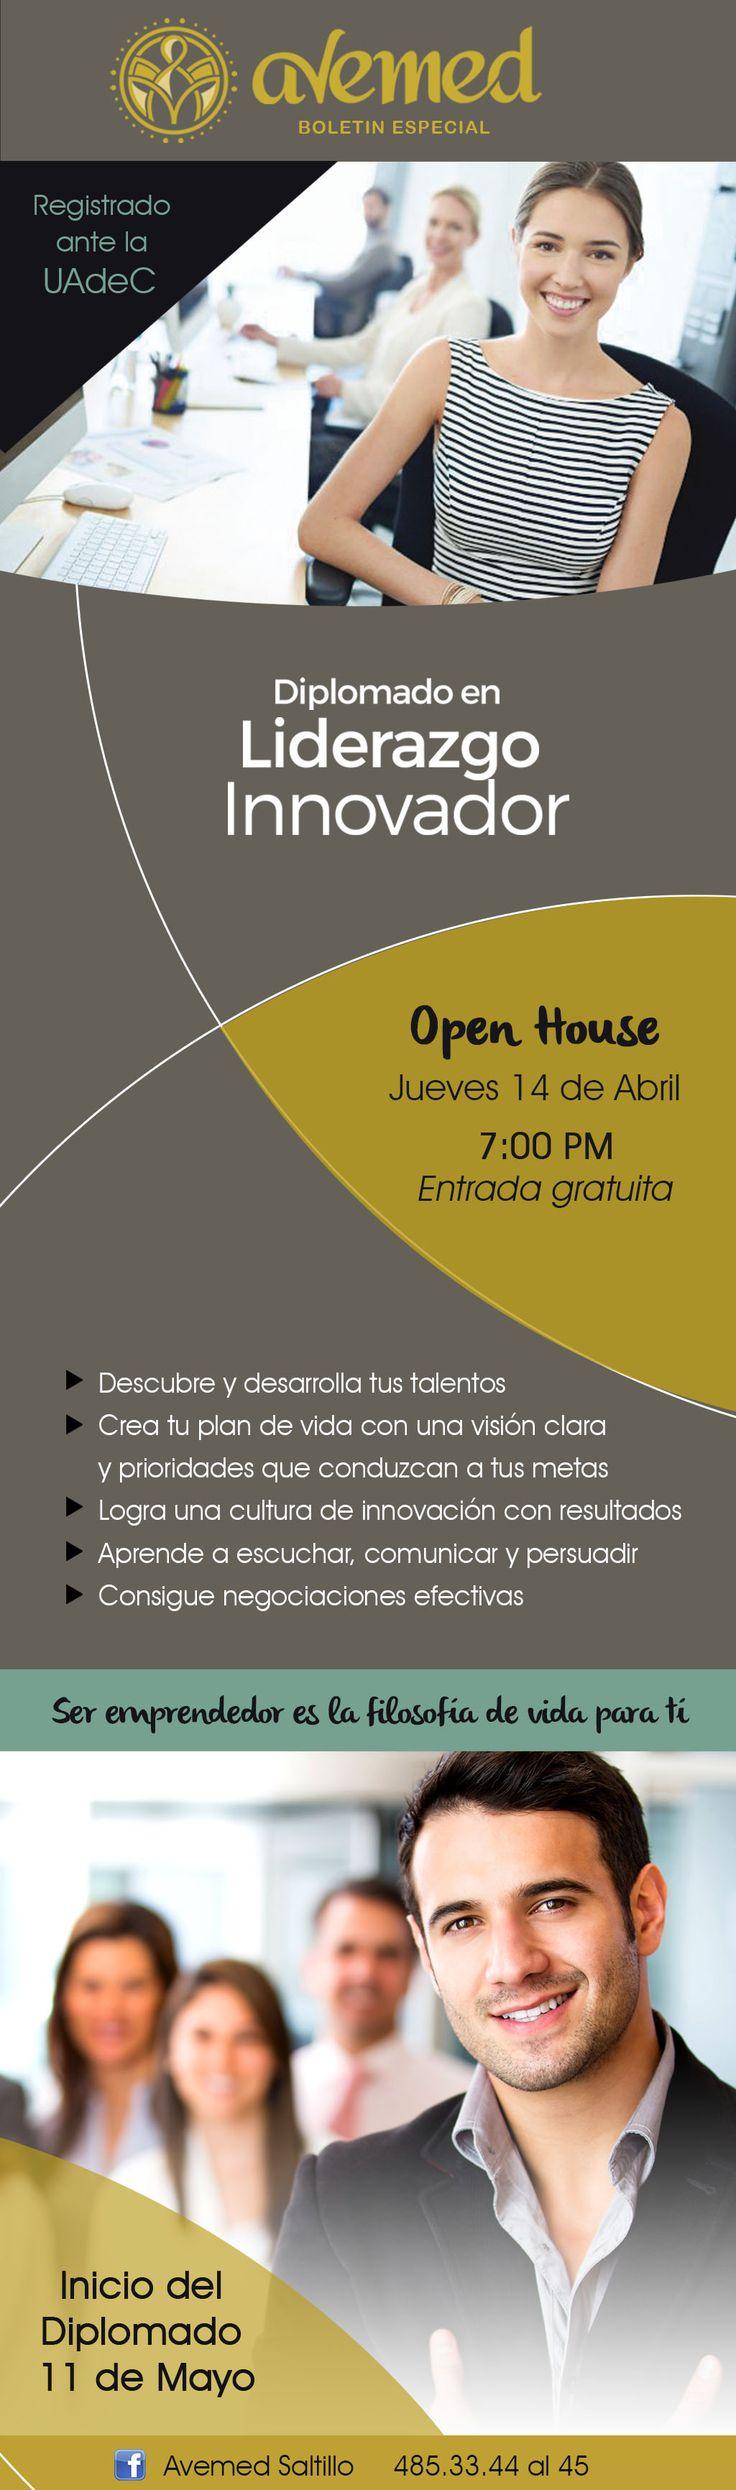 Lanzamiento de Diplomado de Liderazgo Innovador · Yoga, Terapias, Meditación, Ballet Clásico, Ritmos Cubanos, Danza Aérea, Tai Chi, Saltillo, Coahuila